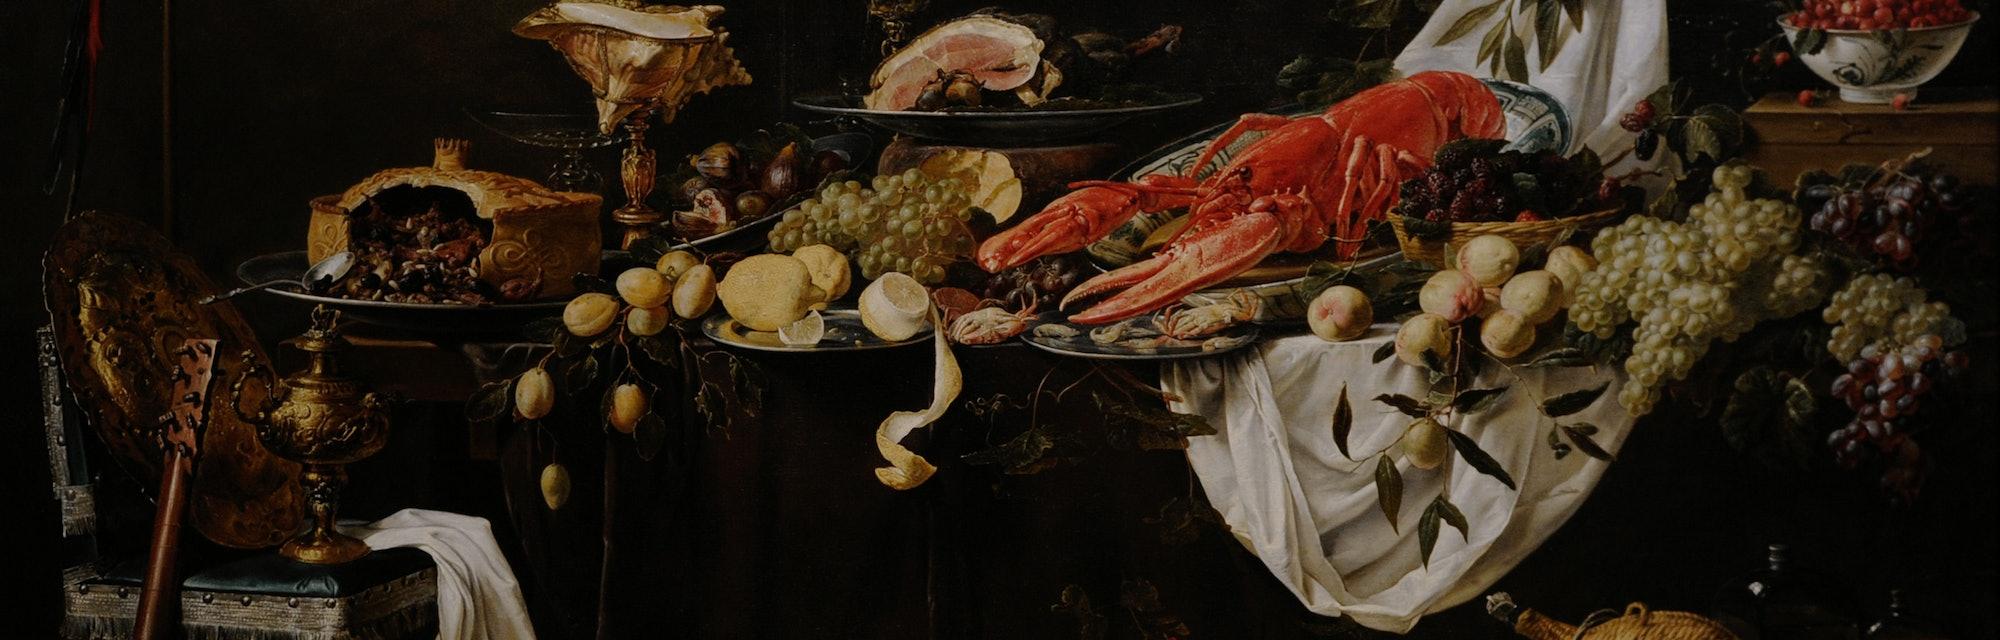 Adriaen van Utrecht (1599-1651/52). Flemish painter. Banquet Still Life, 1644. Rijksmuseum, Amsterdam, Holland. (Photo by: PHAS/Universal Images Group via Getty Images)